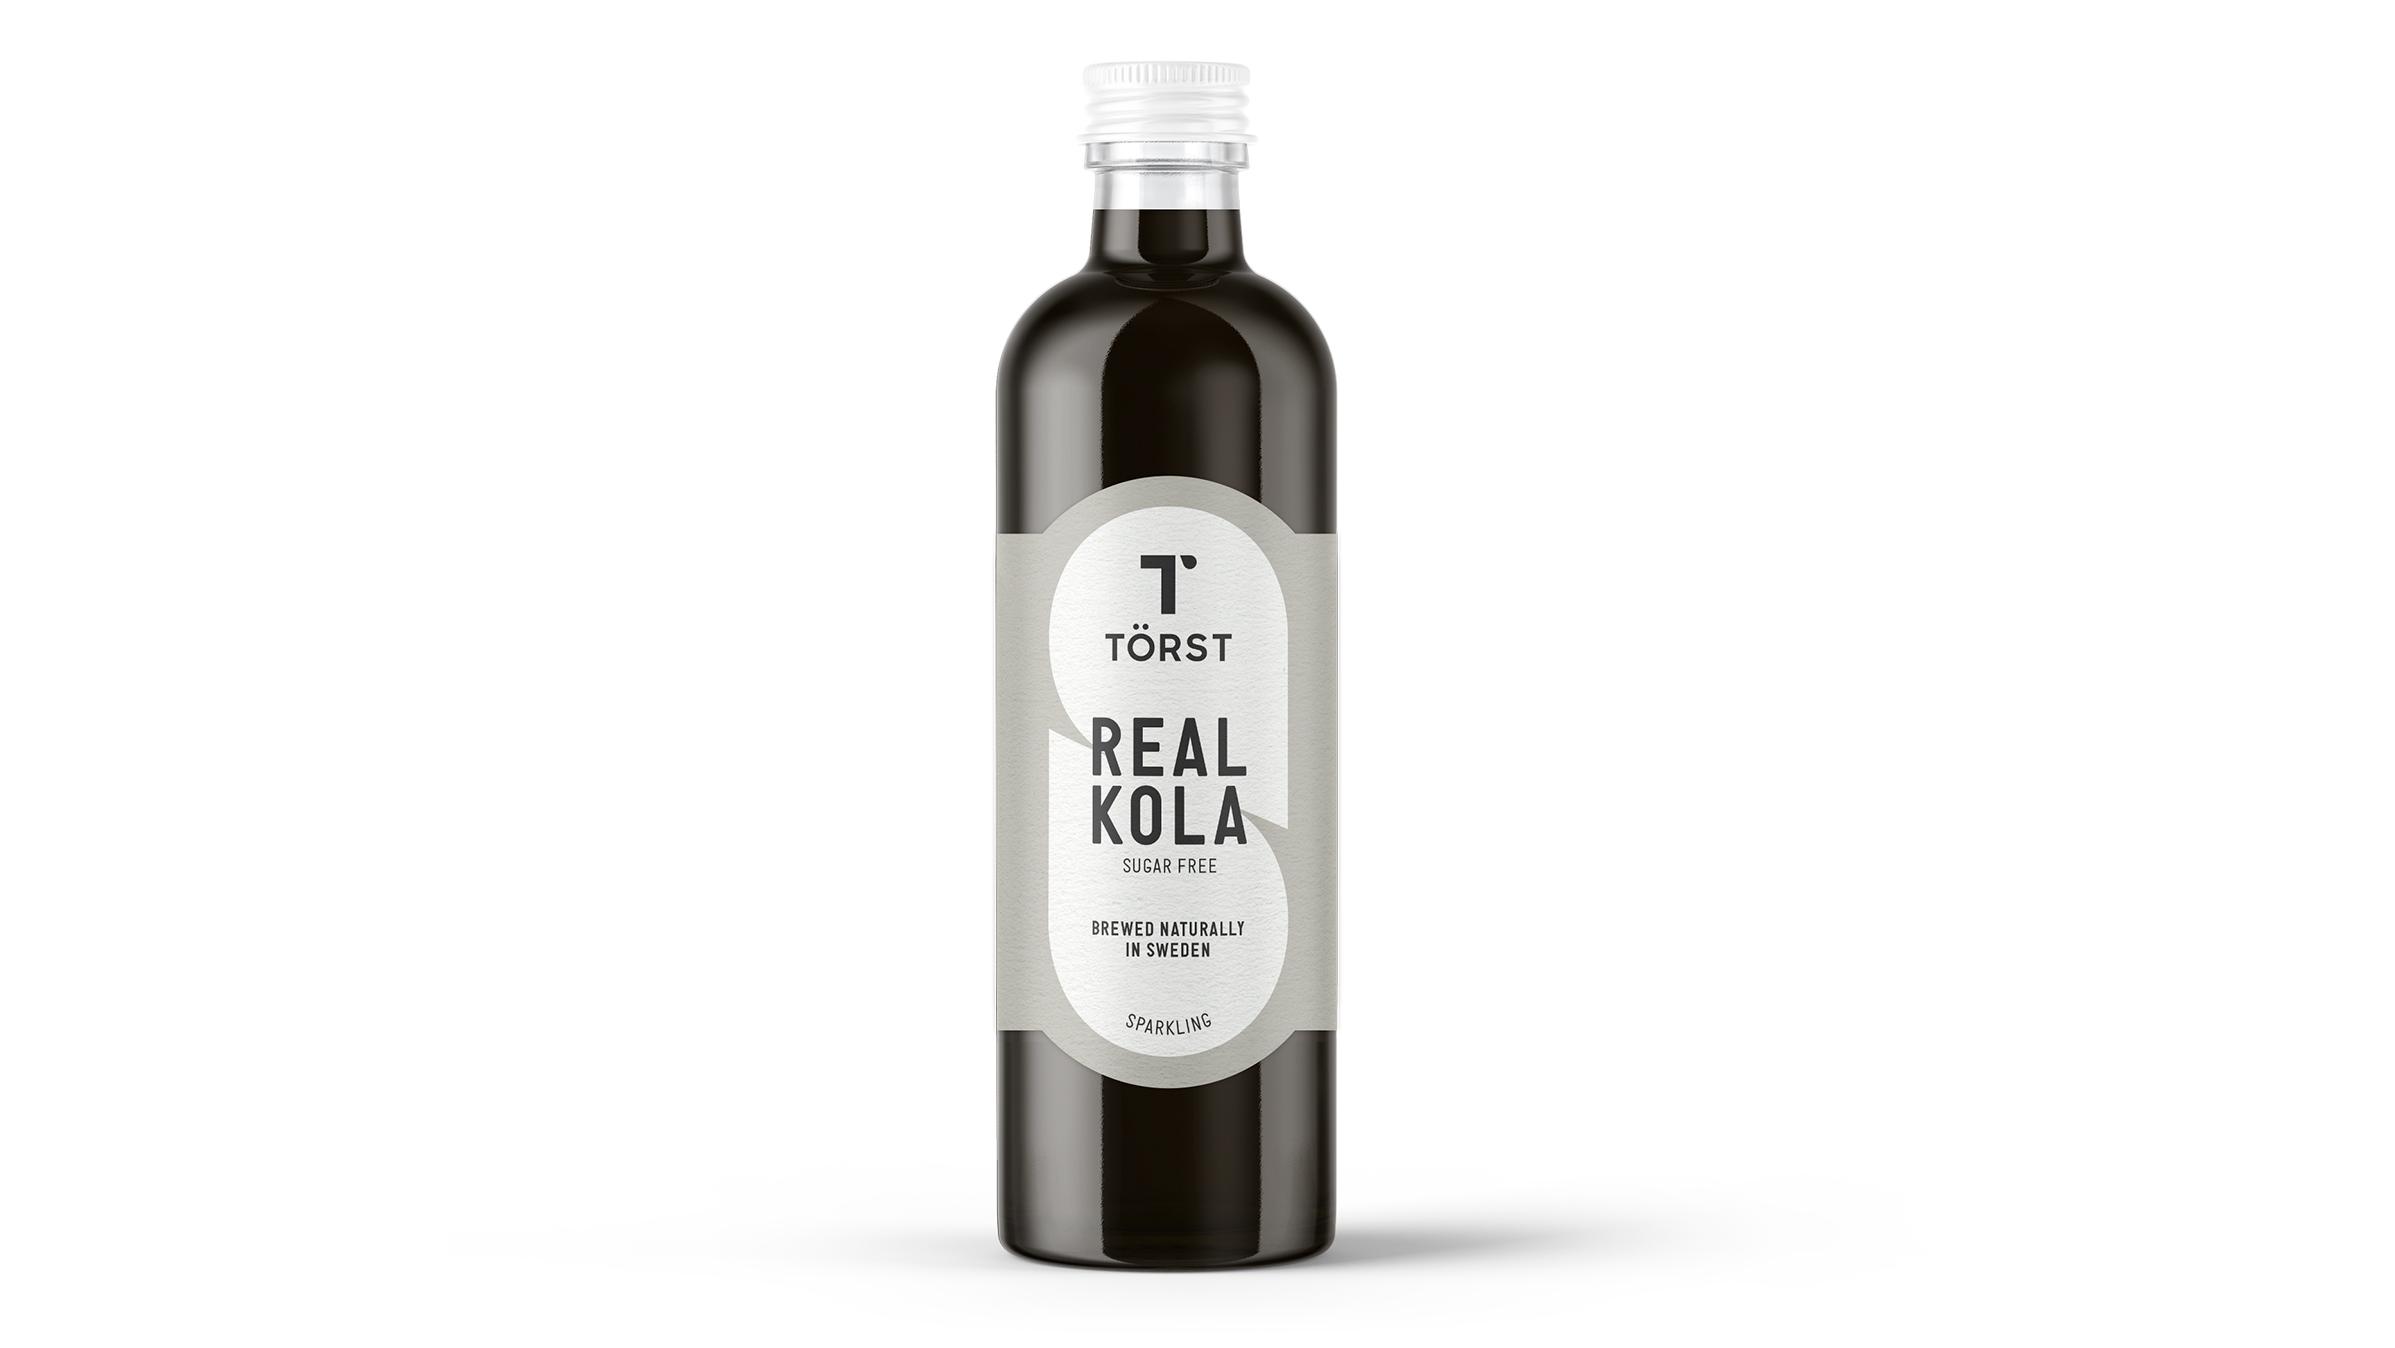 Törst - Real Kola